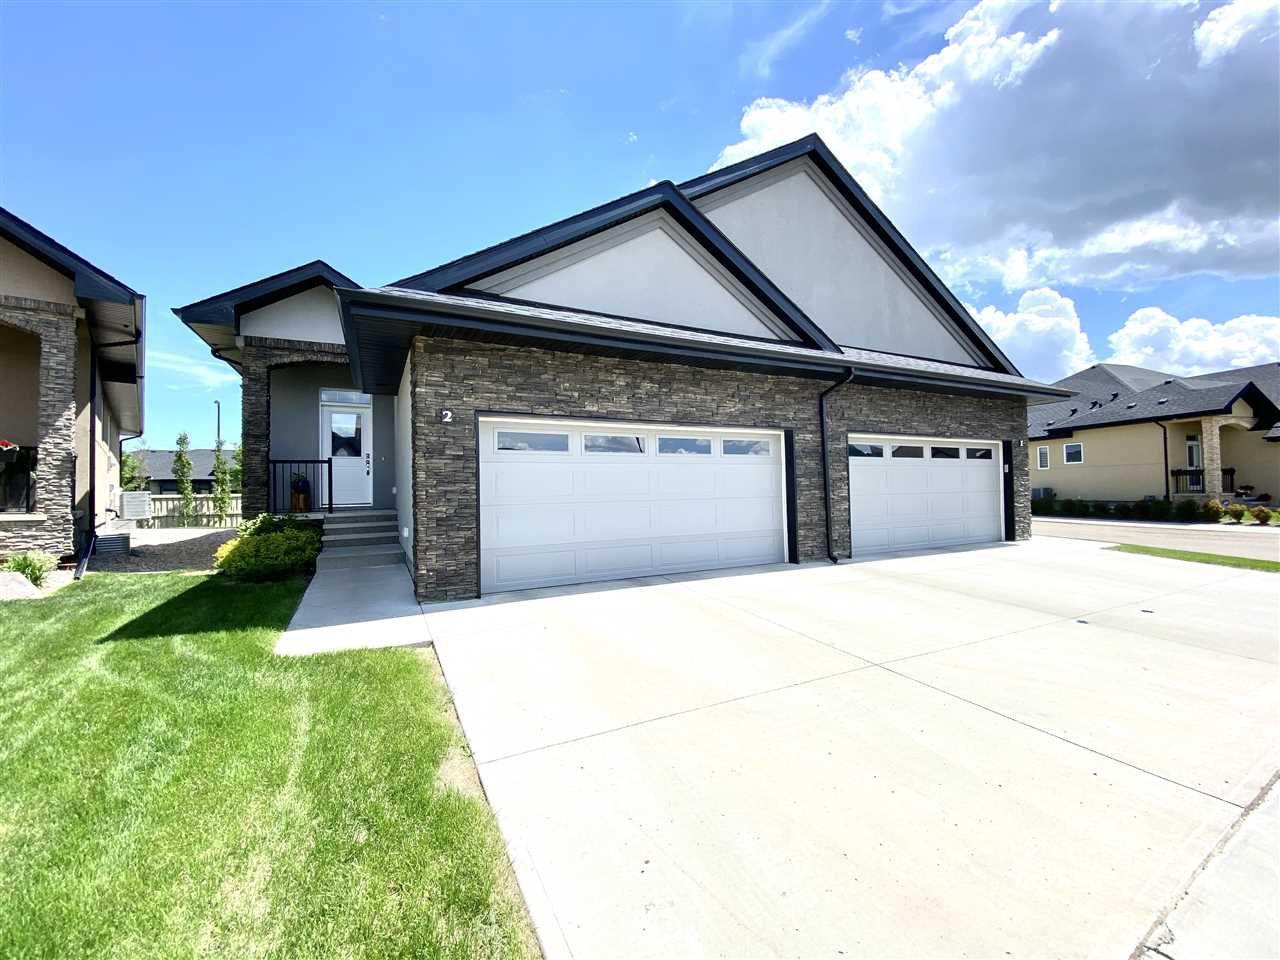 Main Photo: 2 104 ALLARD Link in Edmonton: Zone 55 House Half Duplex for sale : MLS®# E4201408